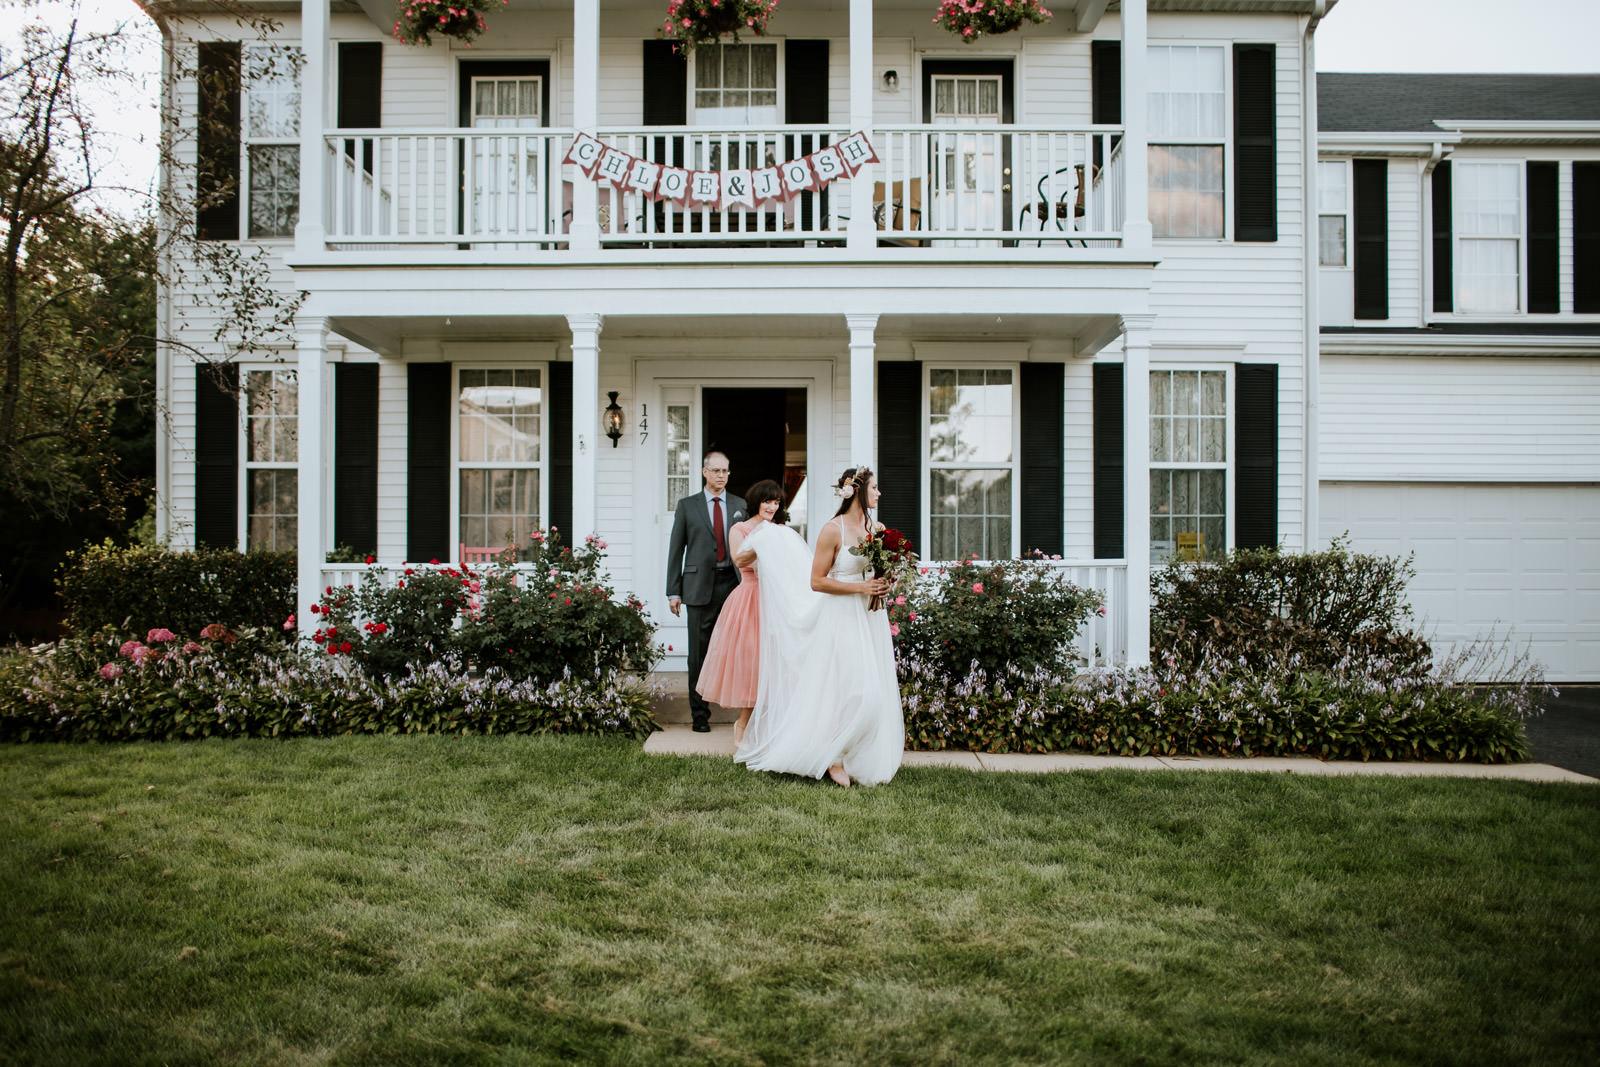 DYI Garden Wedding Photography Chicago Illinois